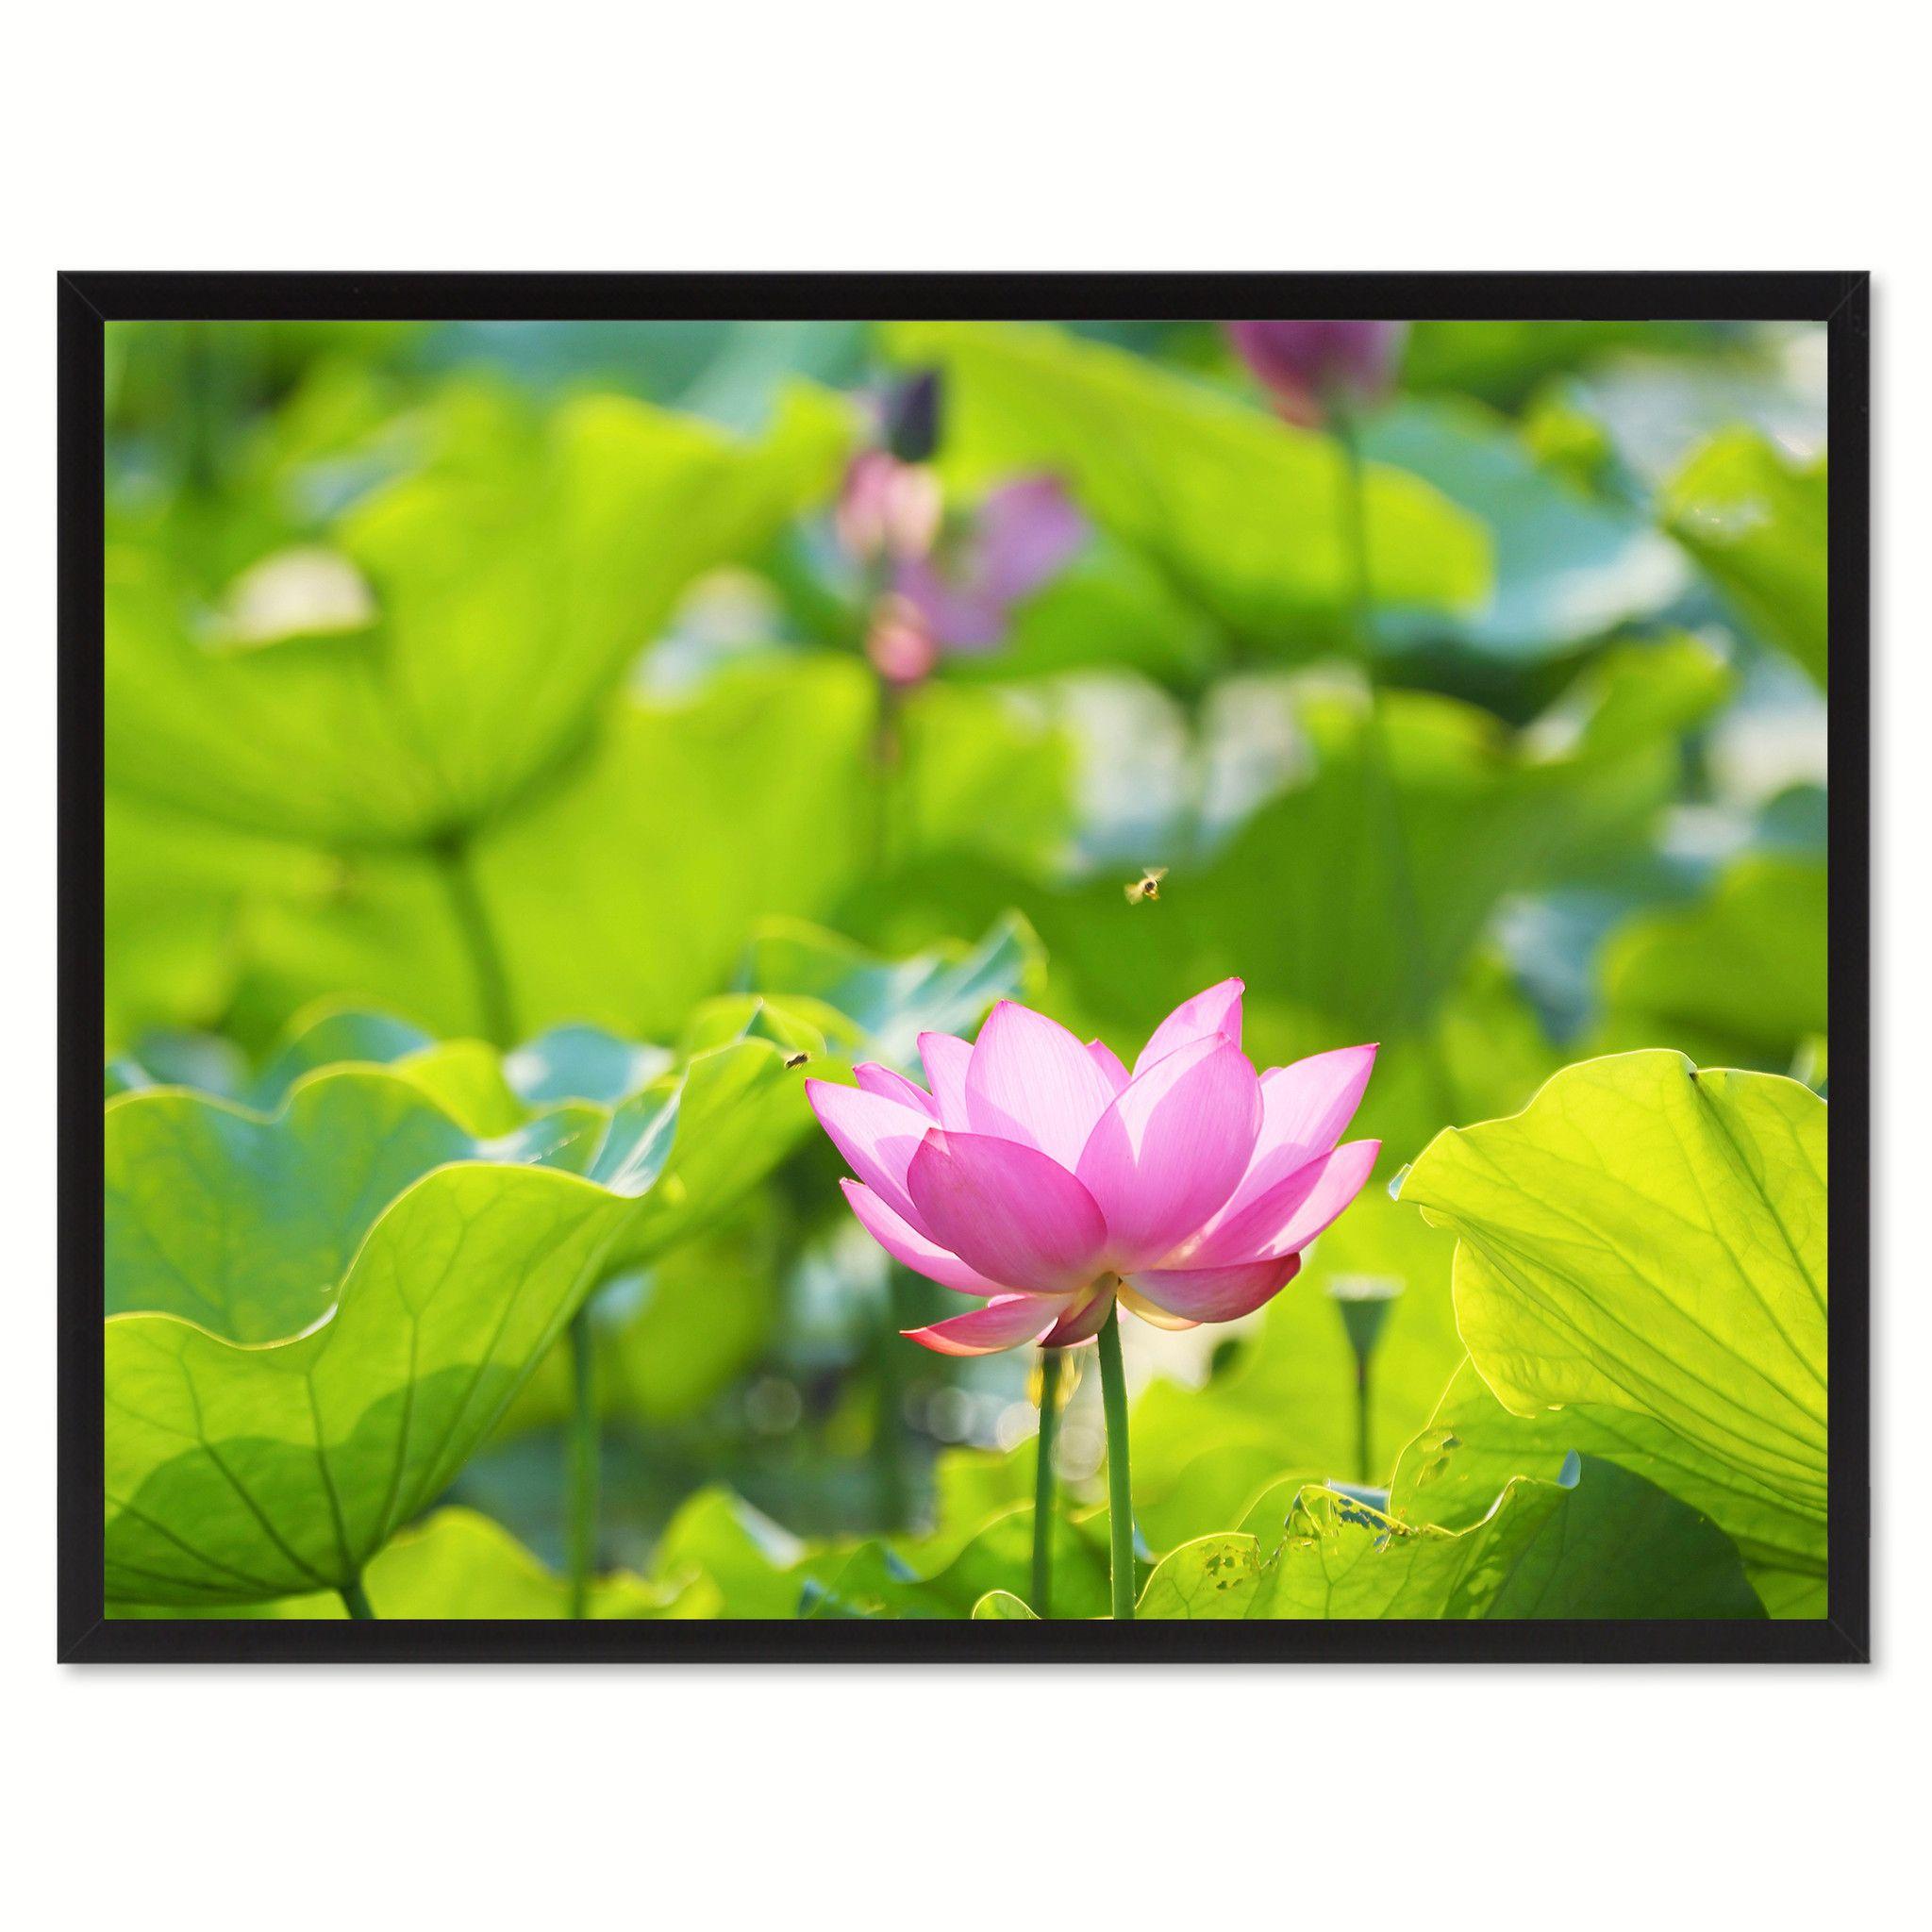 Pink Lotus Flower Framed Canvas Print Home Dcor Wall Art Framed